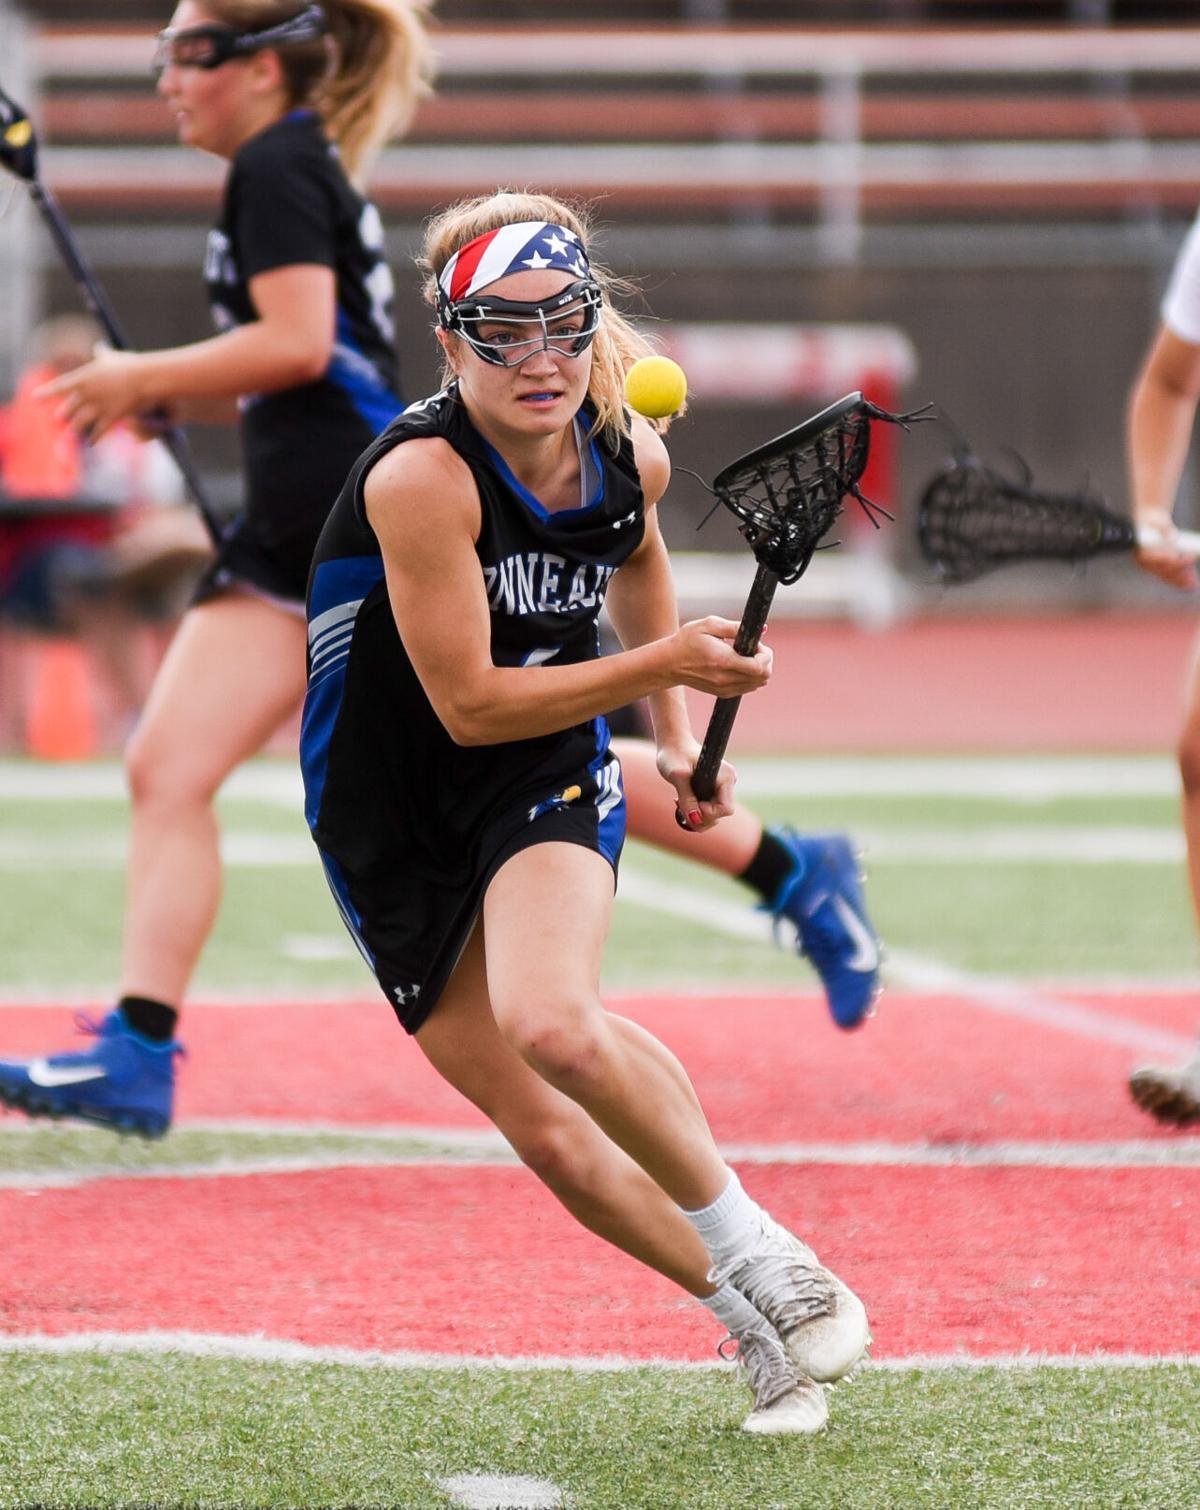 PIAA Playoffs Girls Lacrosse - CASH vs Mars